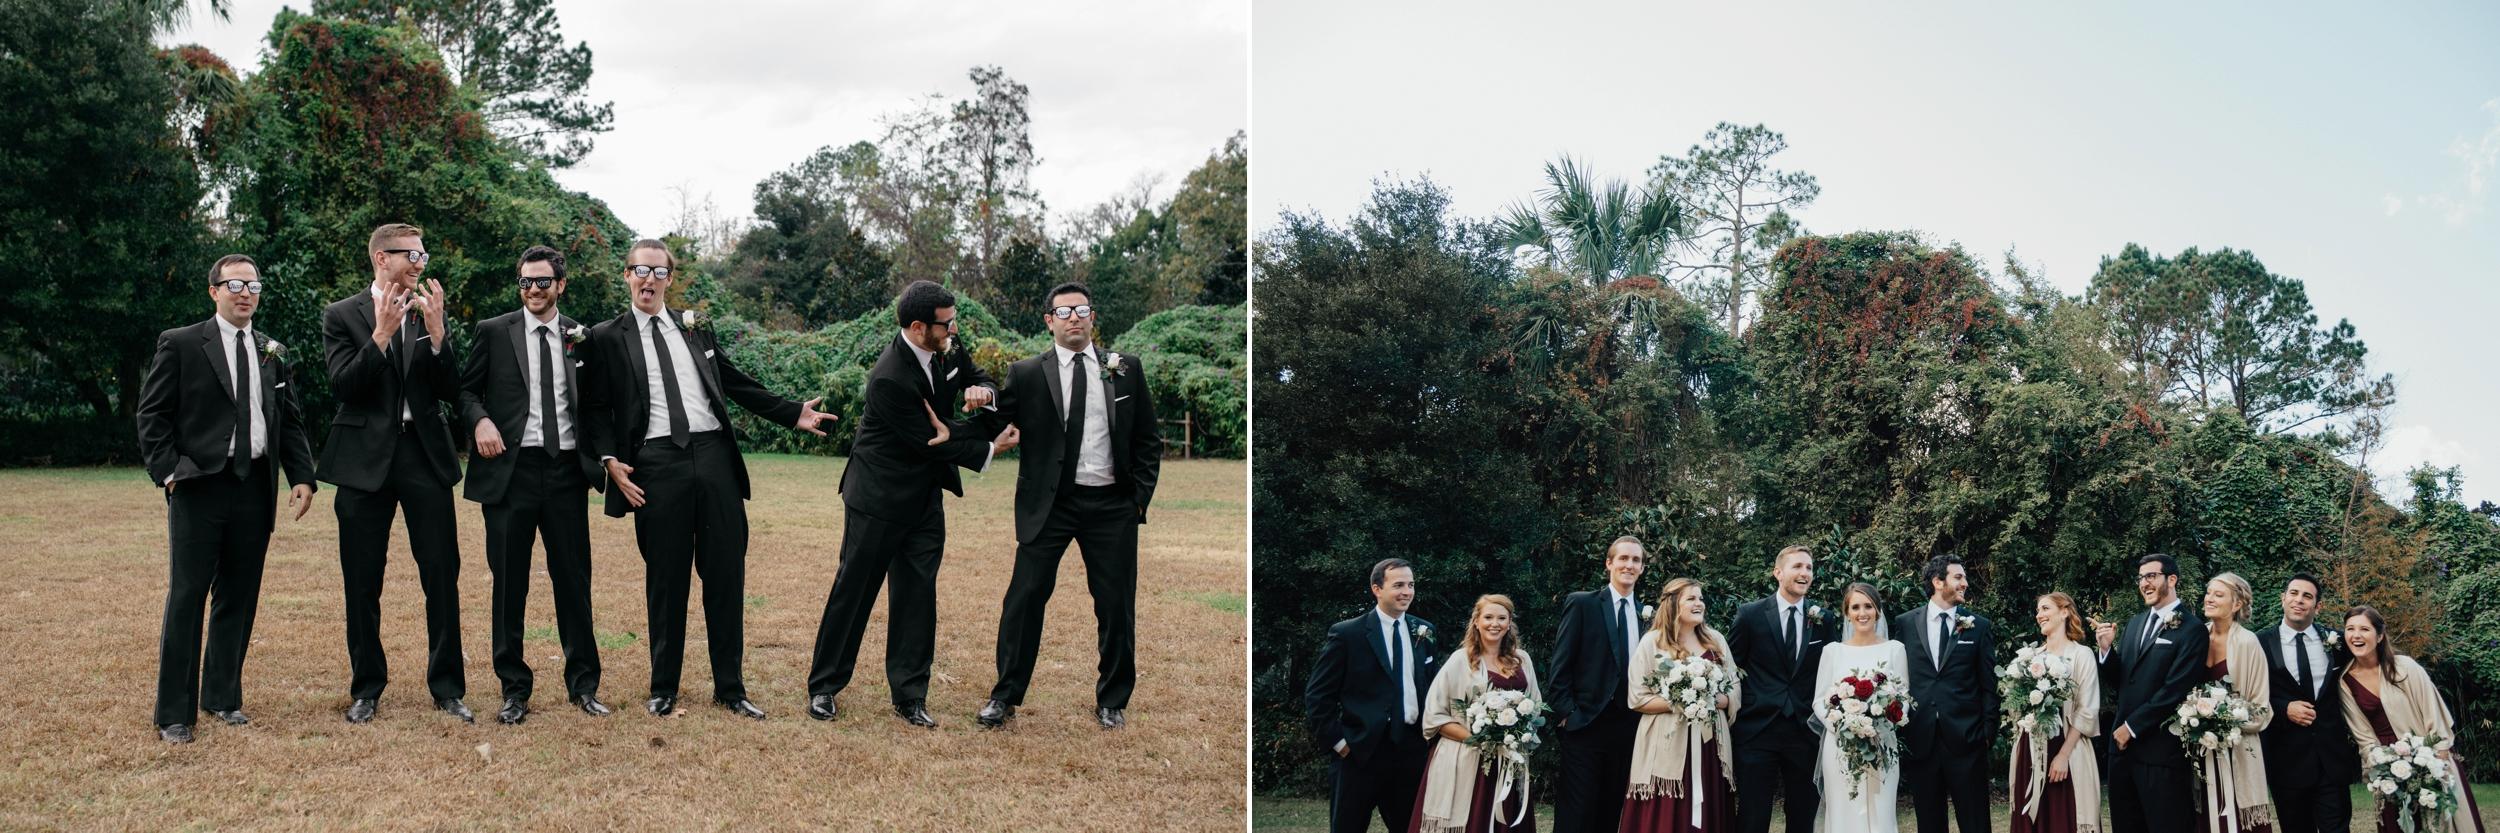 Charlestonweddingphotographer-22.jpg